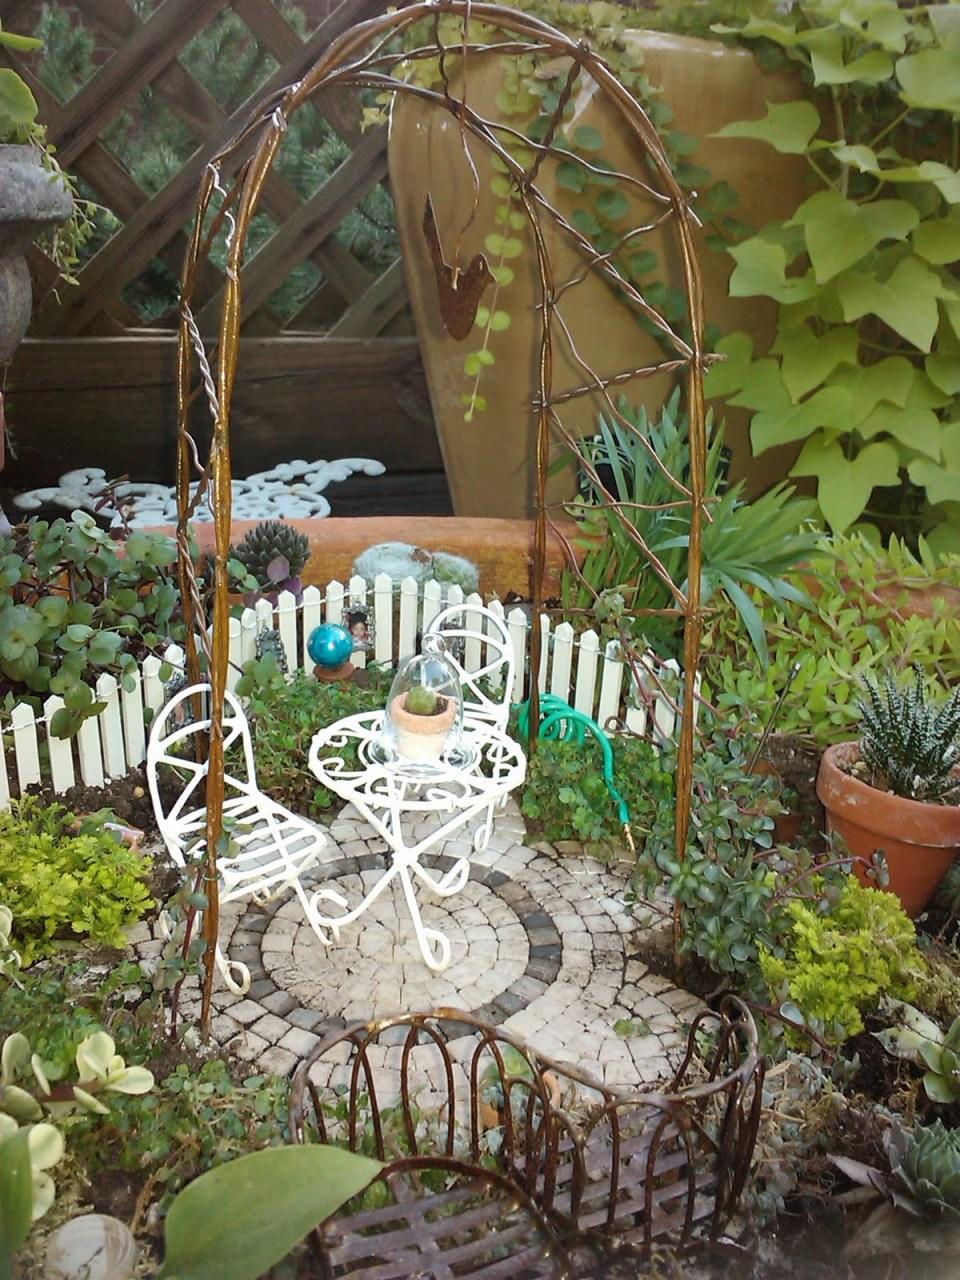 Fairy Garden Ideas: Hunnicutt land fairy garden